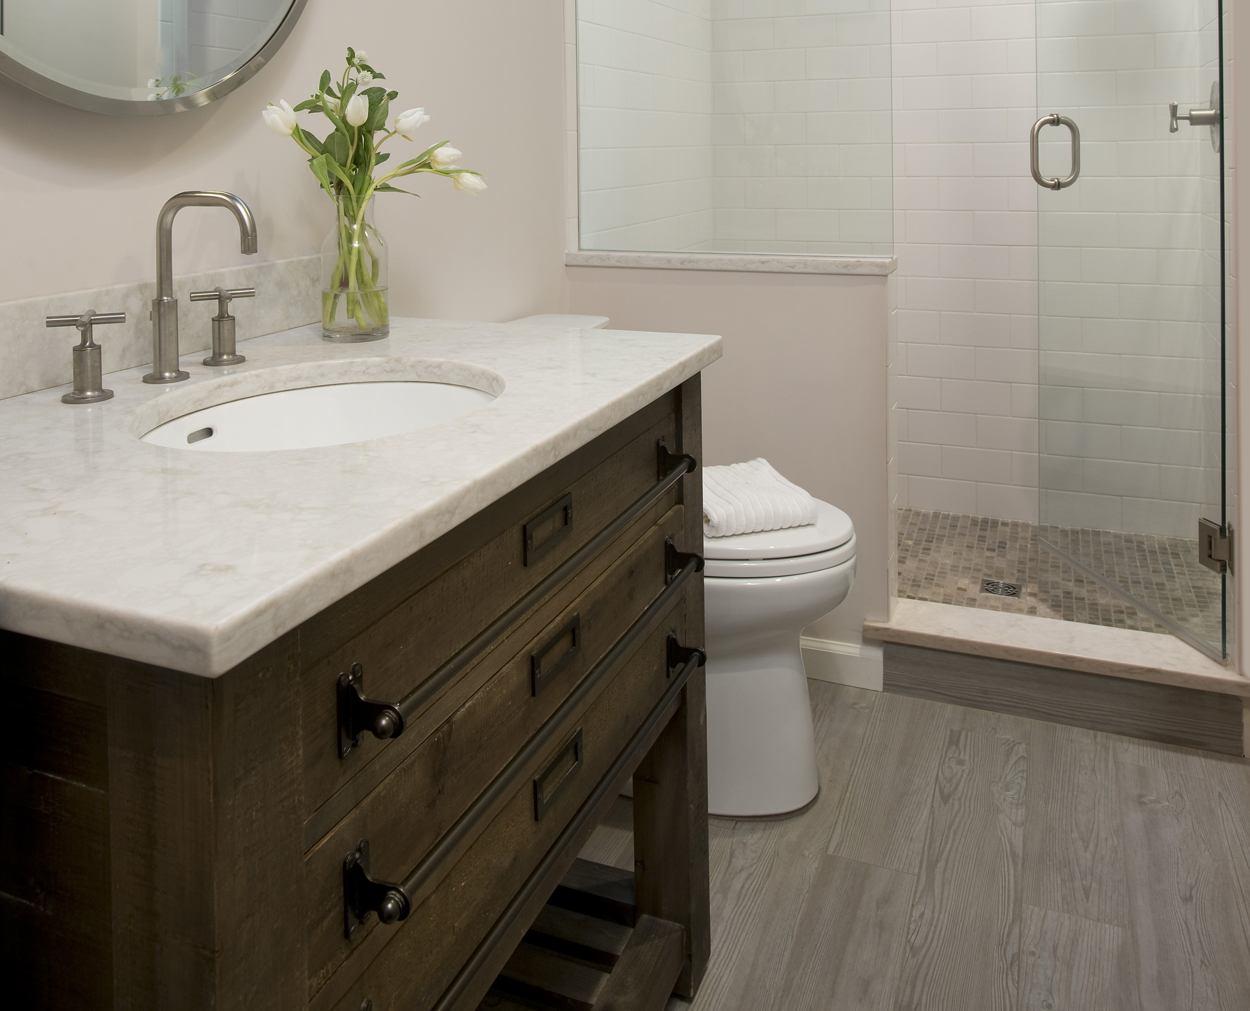 Restoration Hardware vanity and frameless shower door.